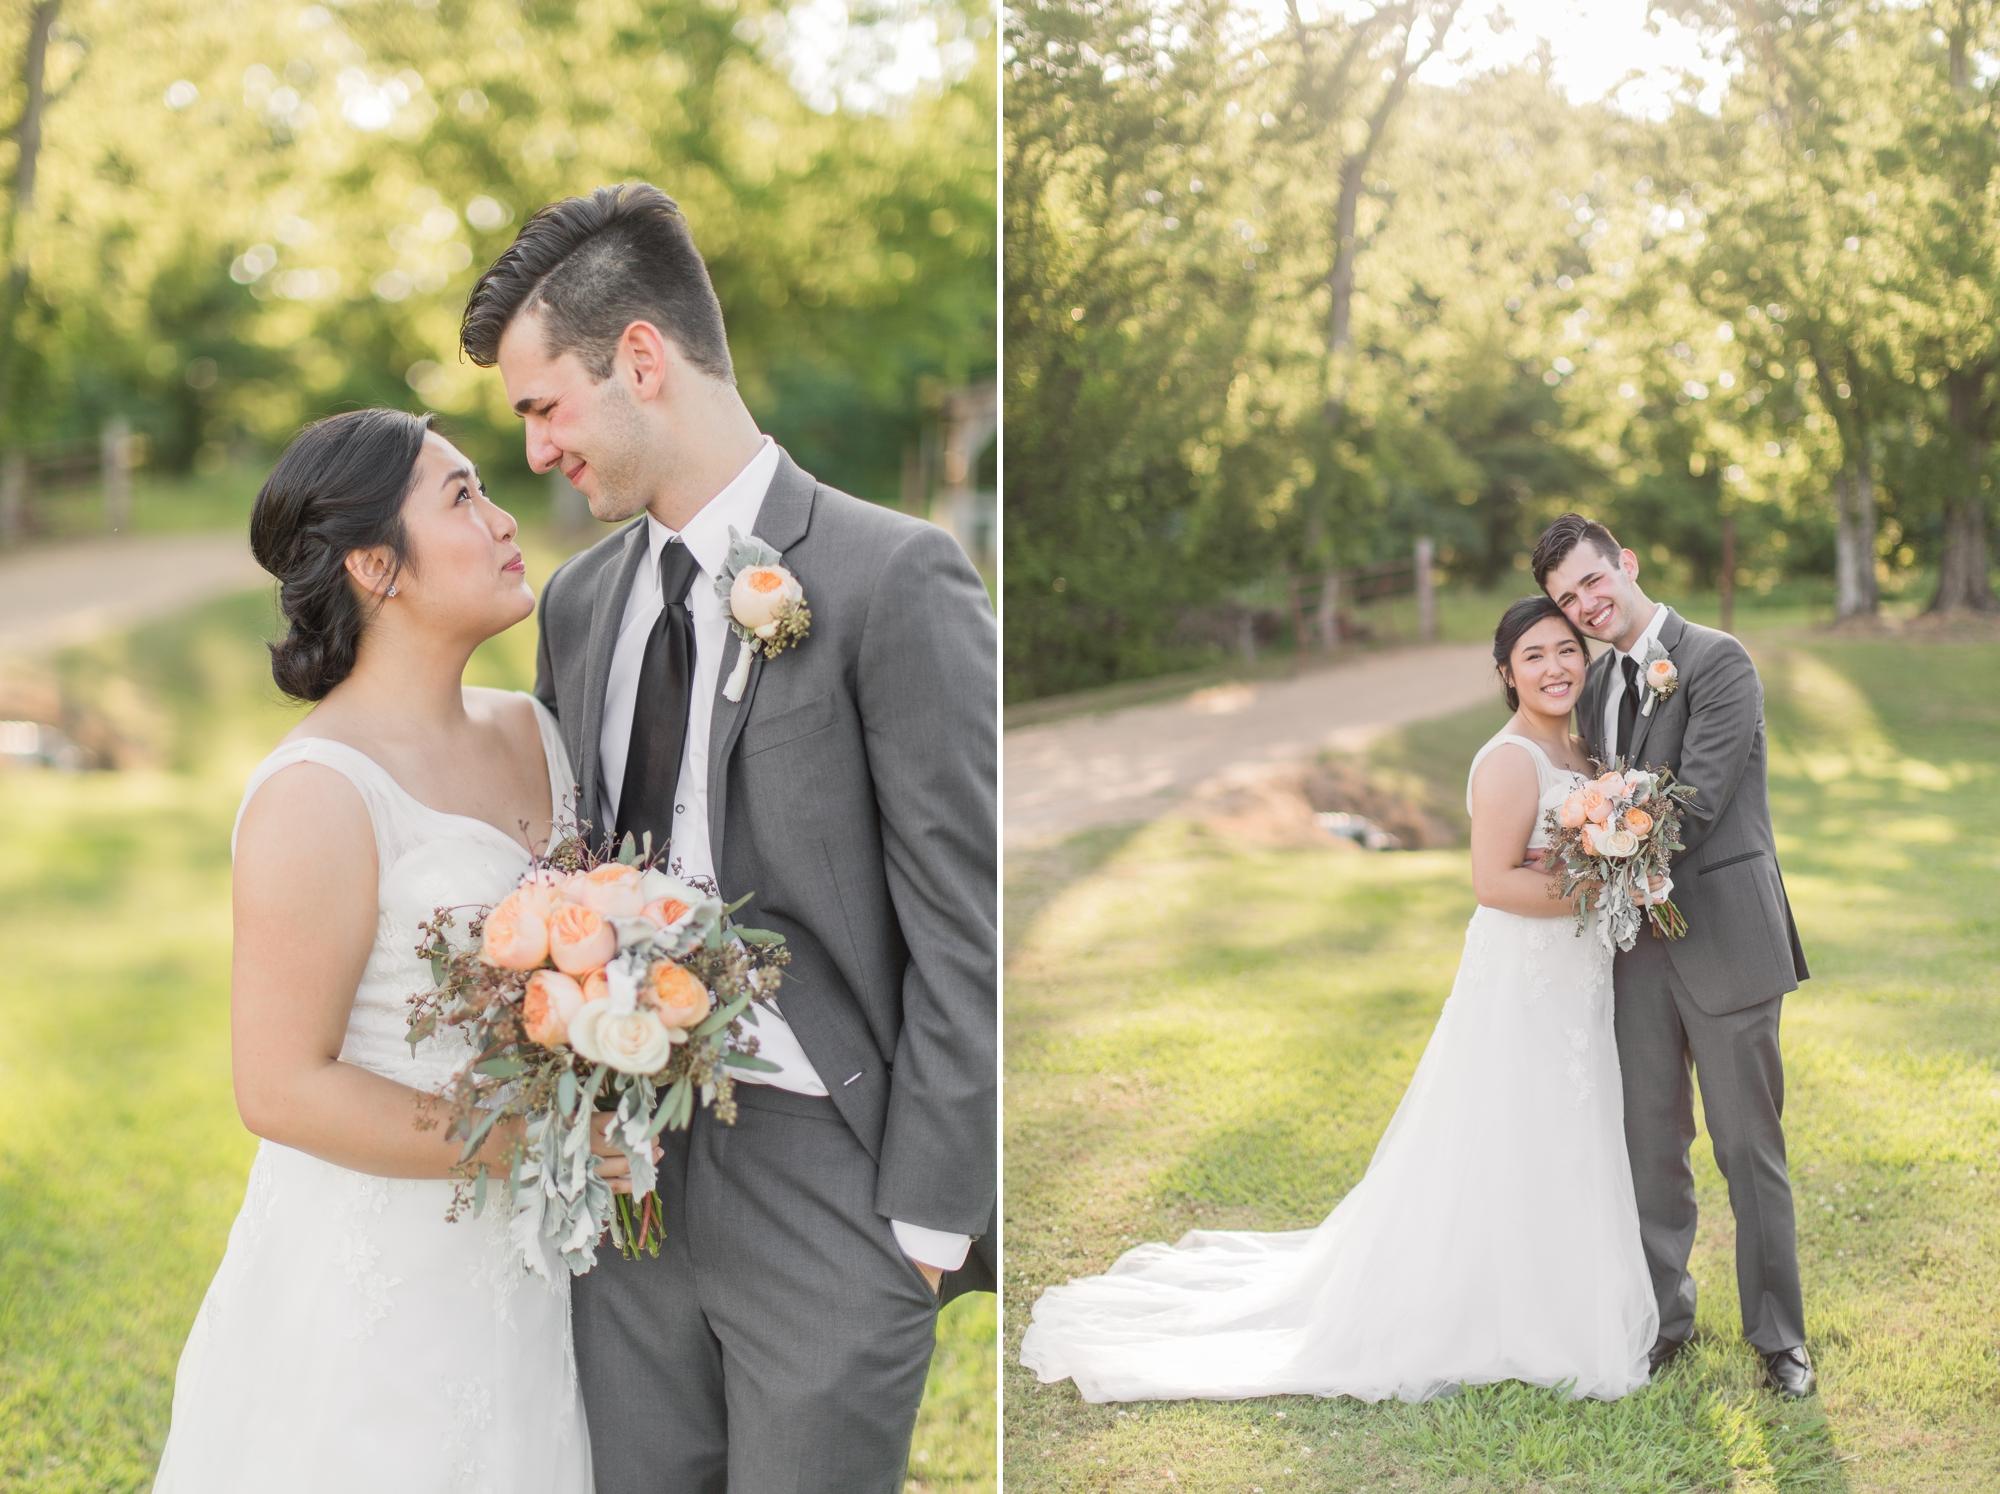 giles wedding blog 31.jpg